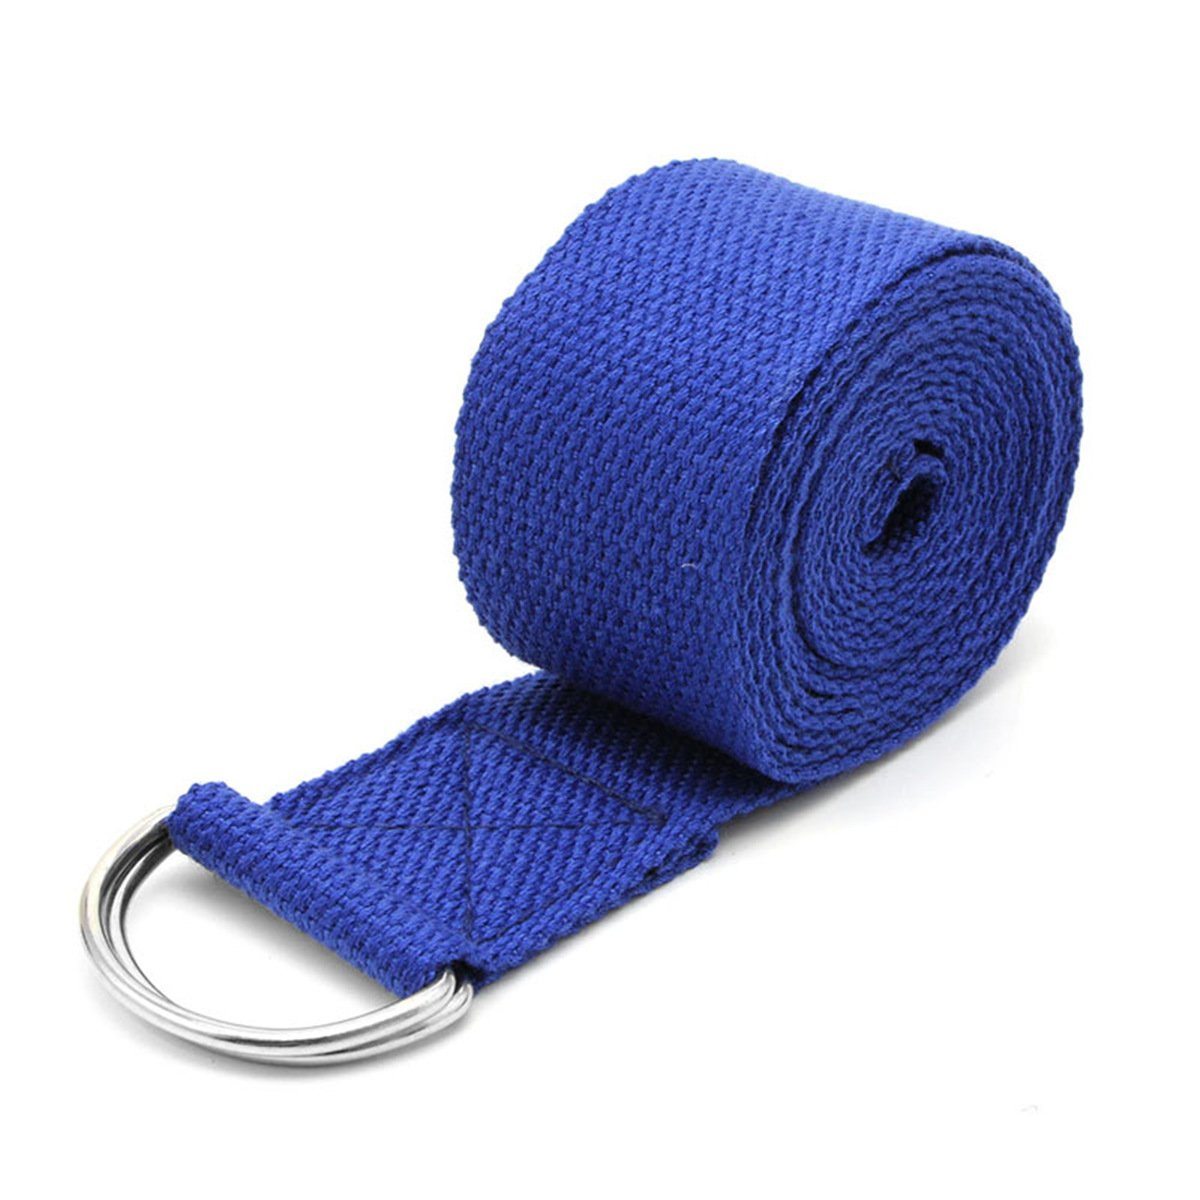 Amazon.com : ECYC Adjustable Yoga Strap Waist Leg Fitness ...